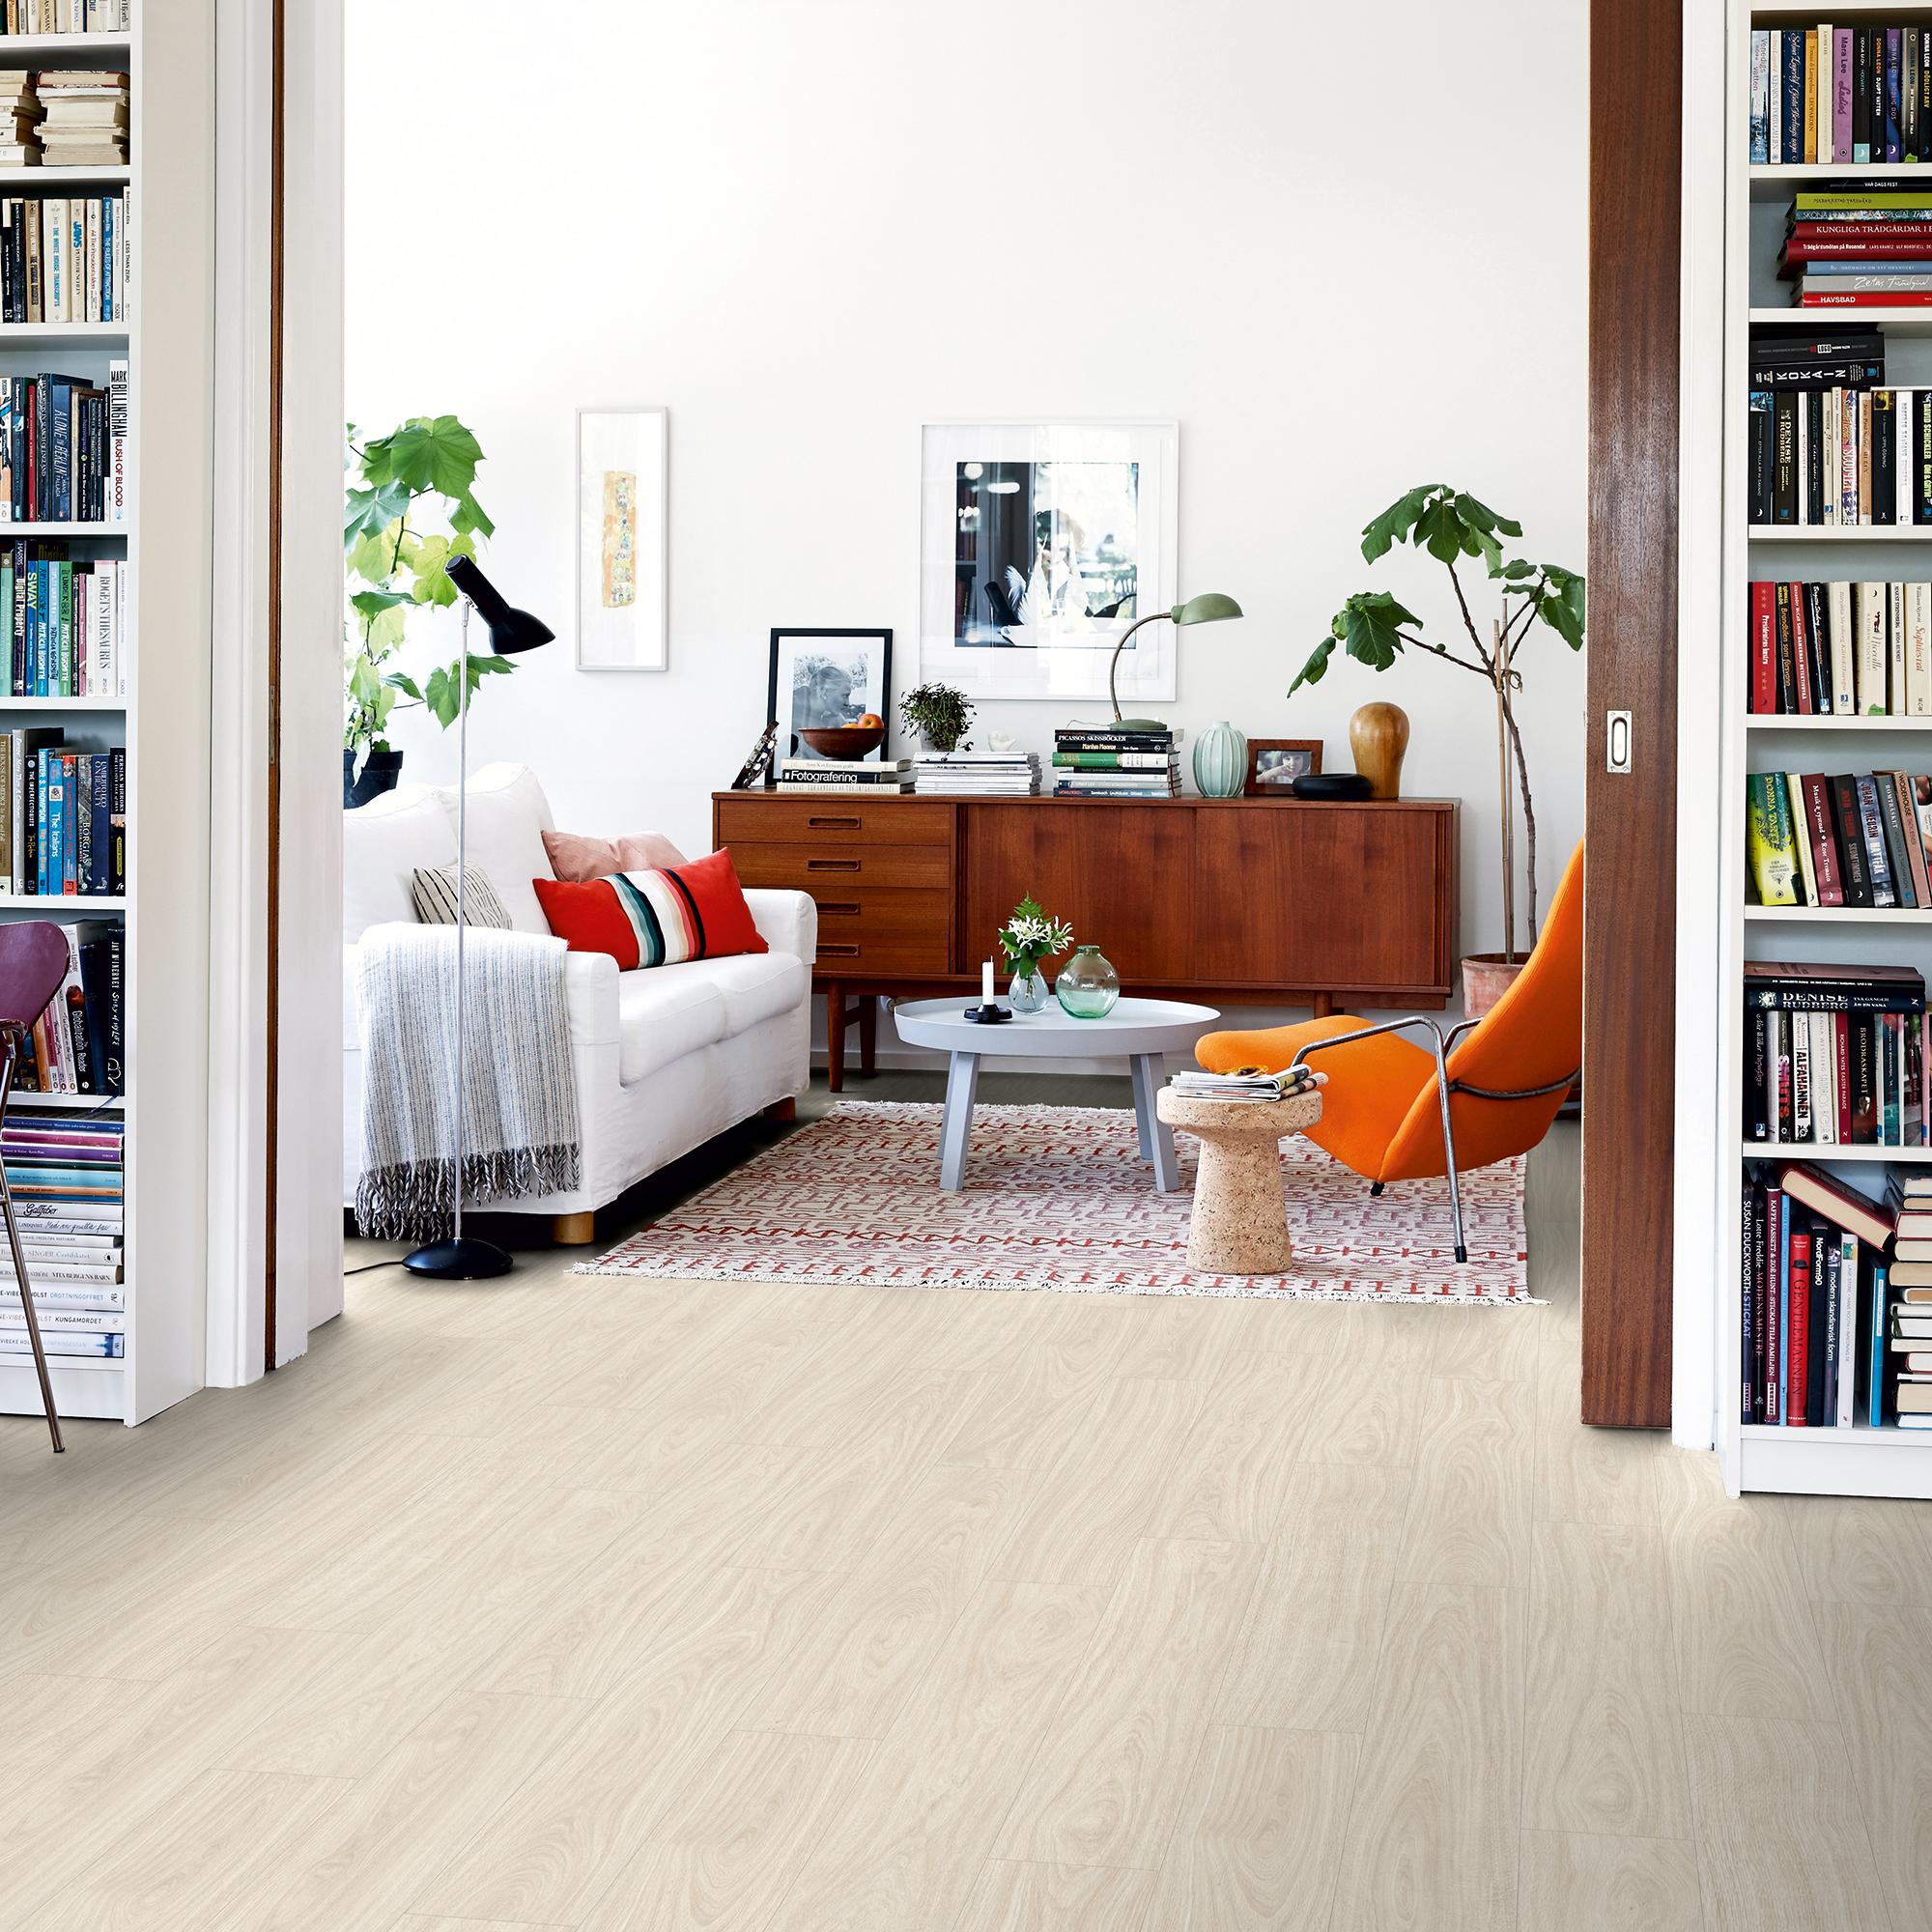 Vinylgolv Pergo Classic Plank Nordic White Oak 1-Stav